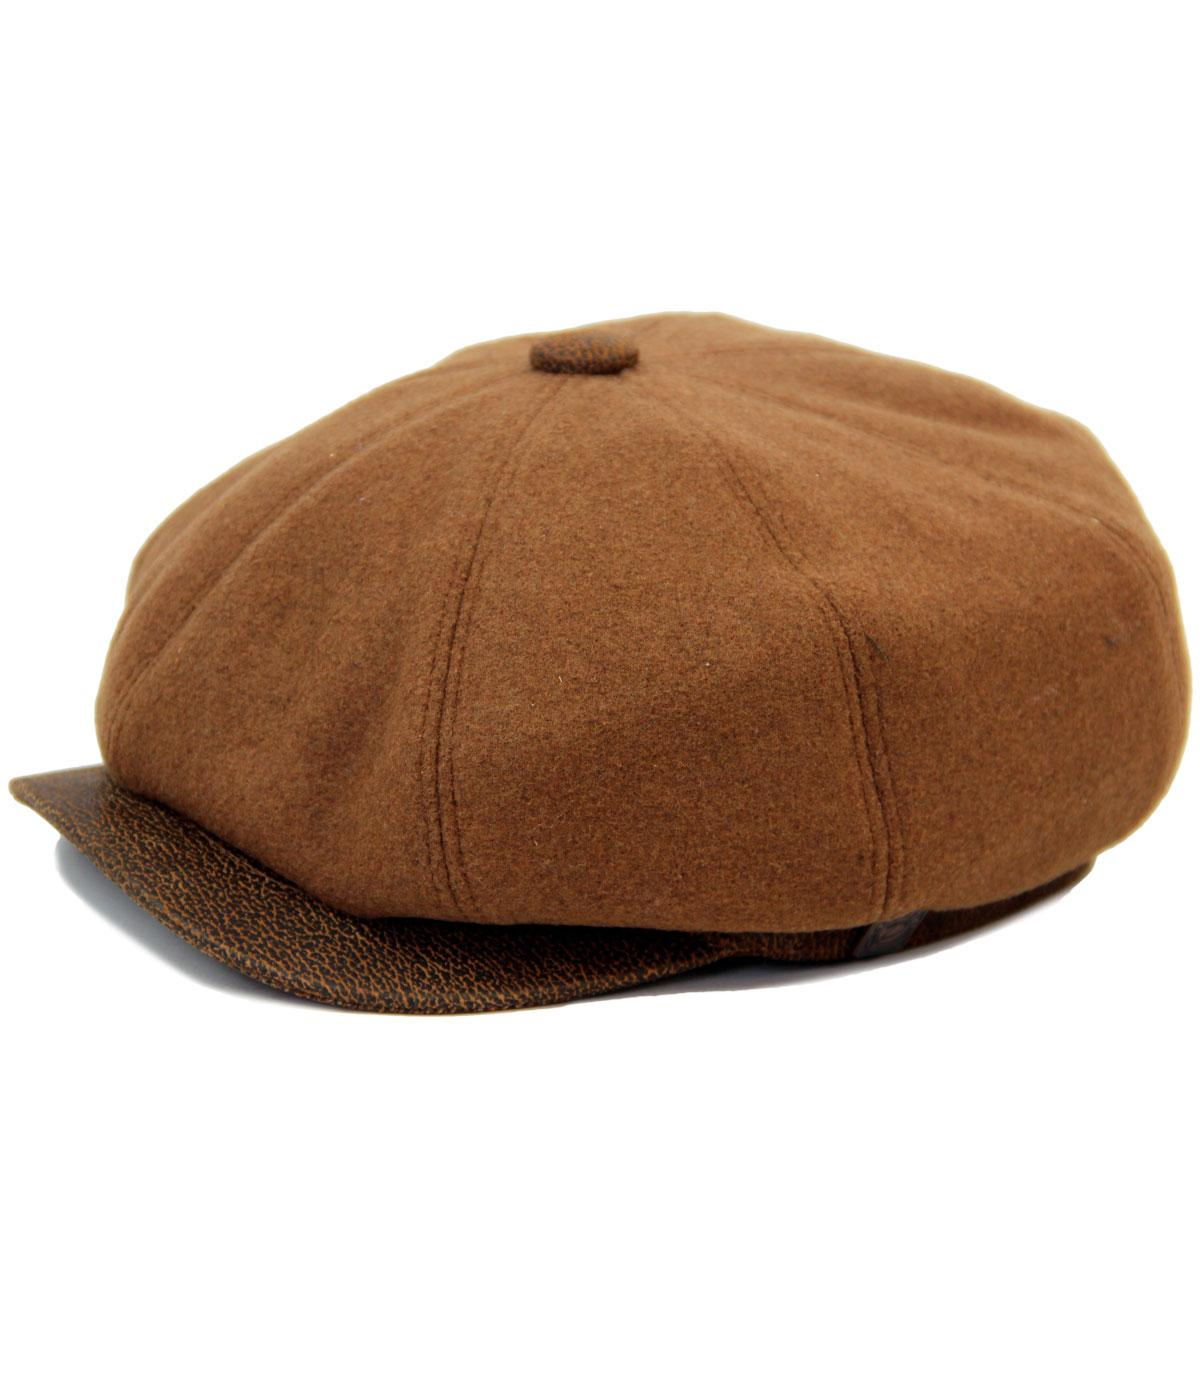 Eden DASMARCA Retro Leather Gatsby Cap